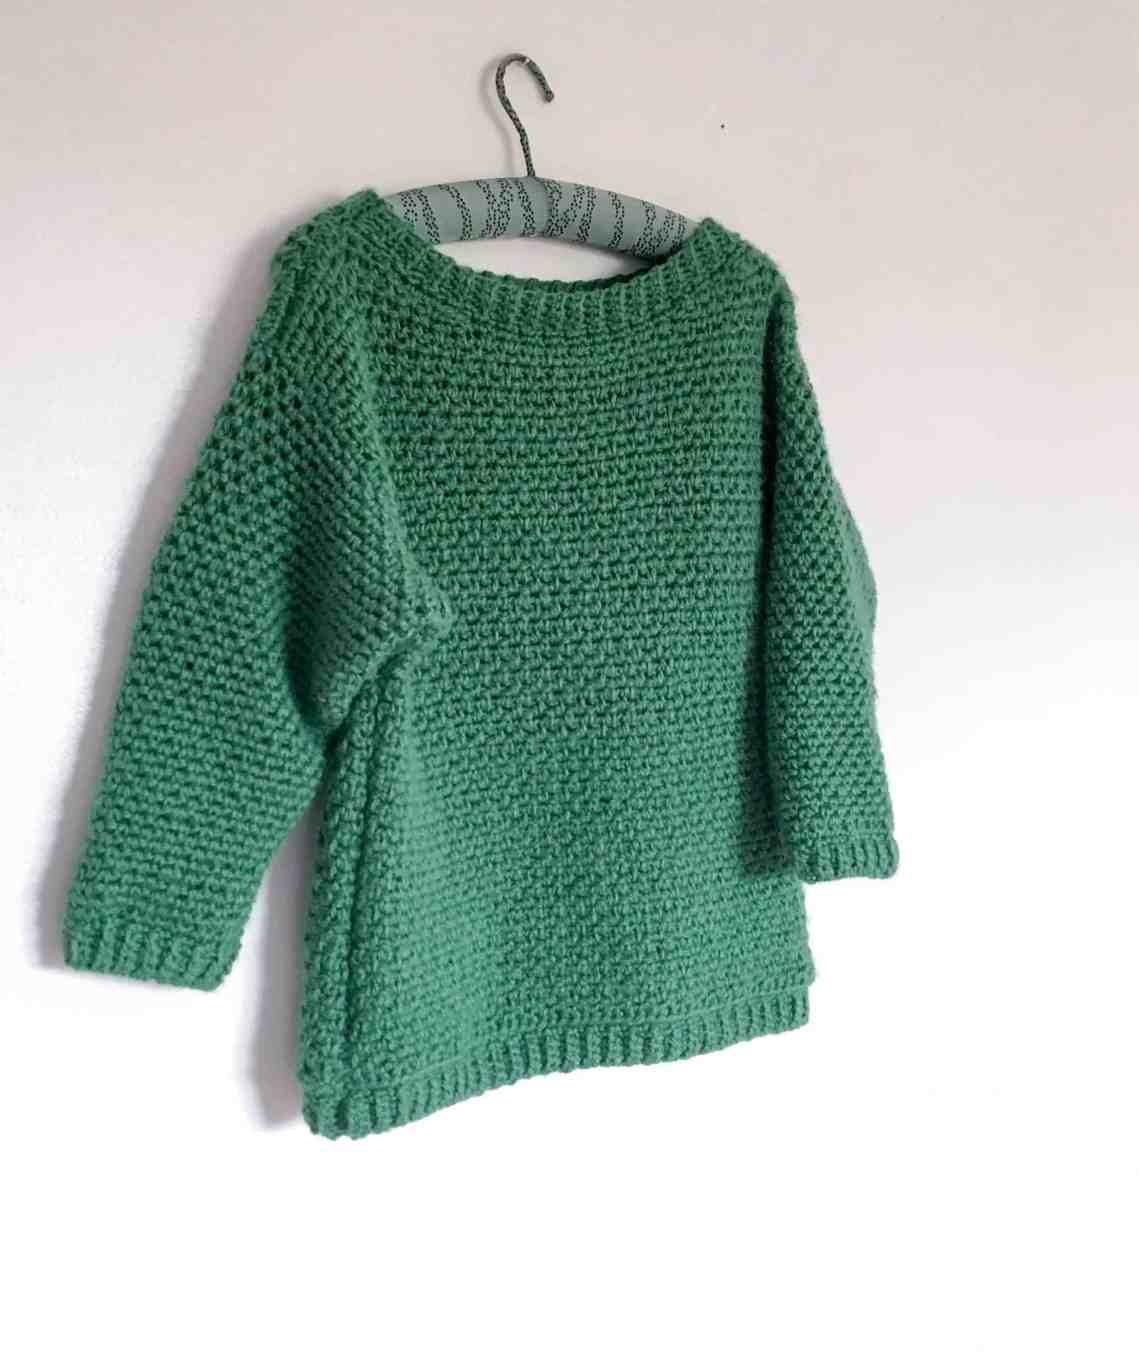 The Upsidedown Crochet Sweater Pattern from Doradoes.co.uk